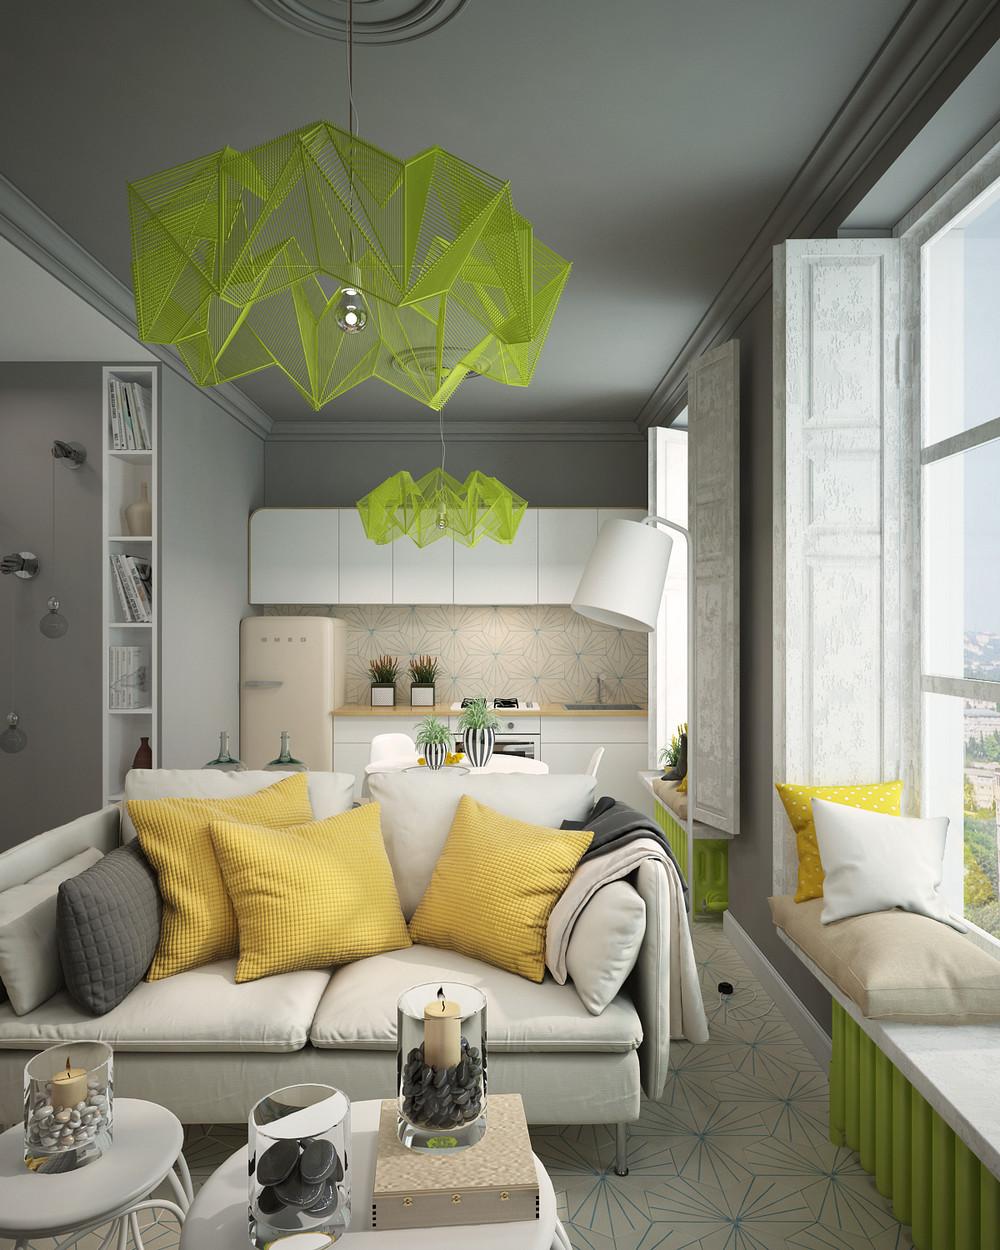 Дизайн квартиры с яркими акцентами